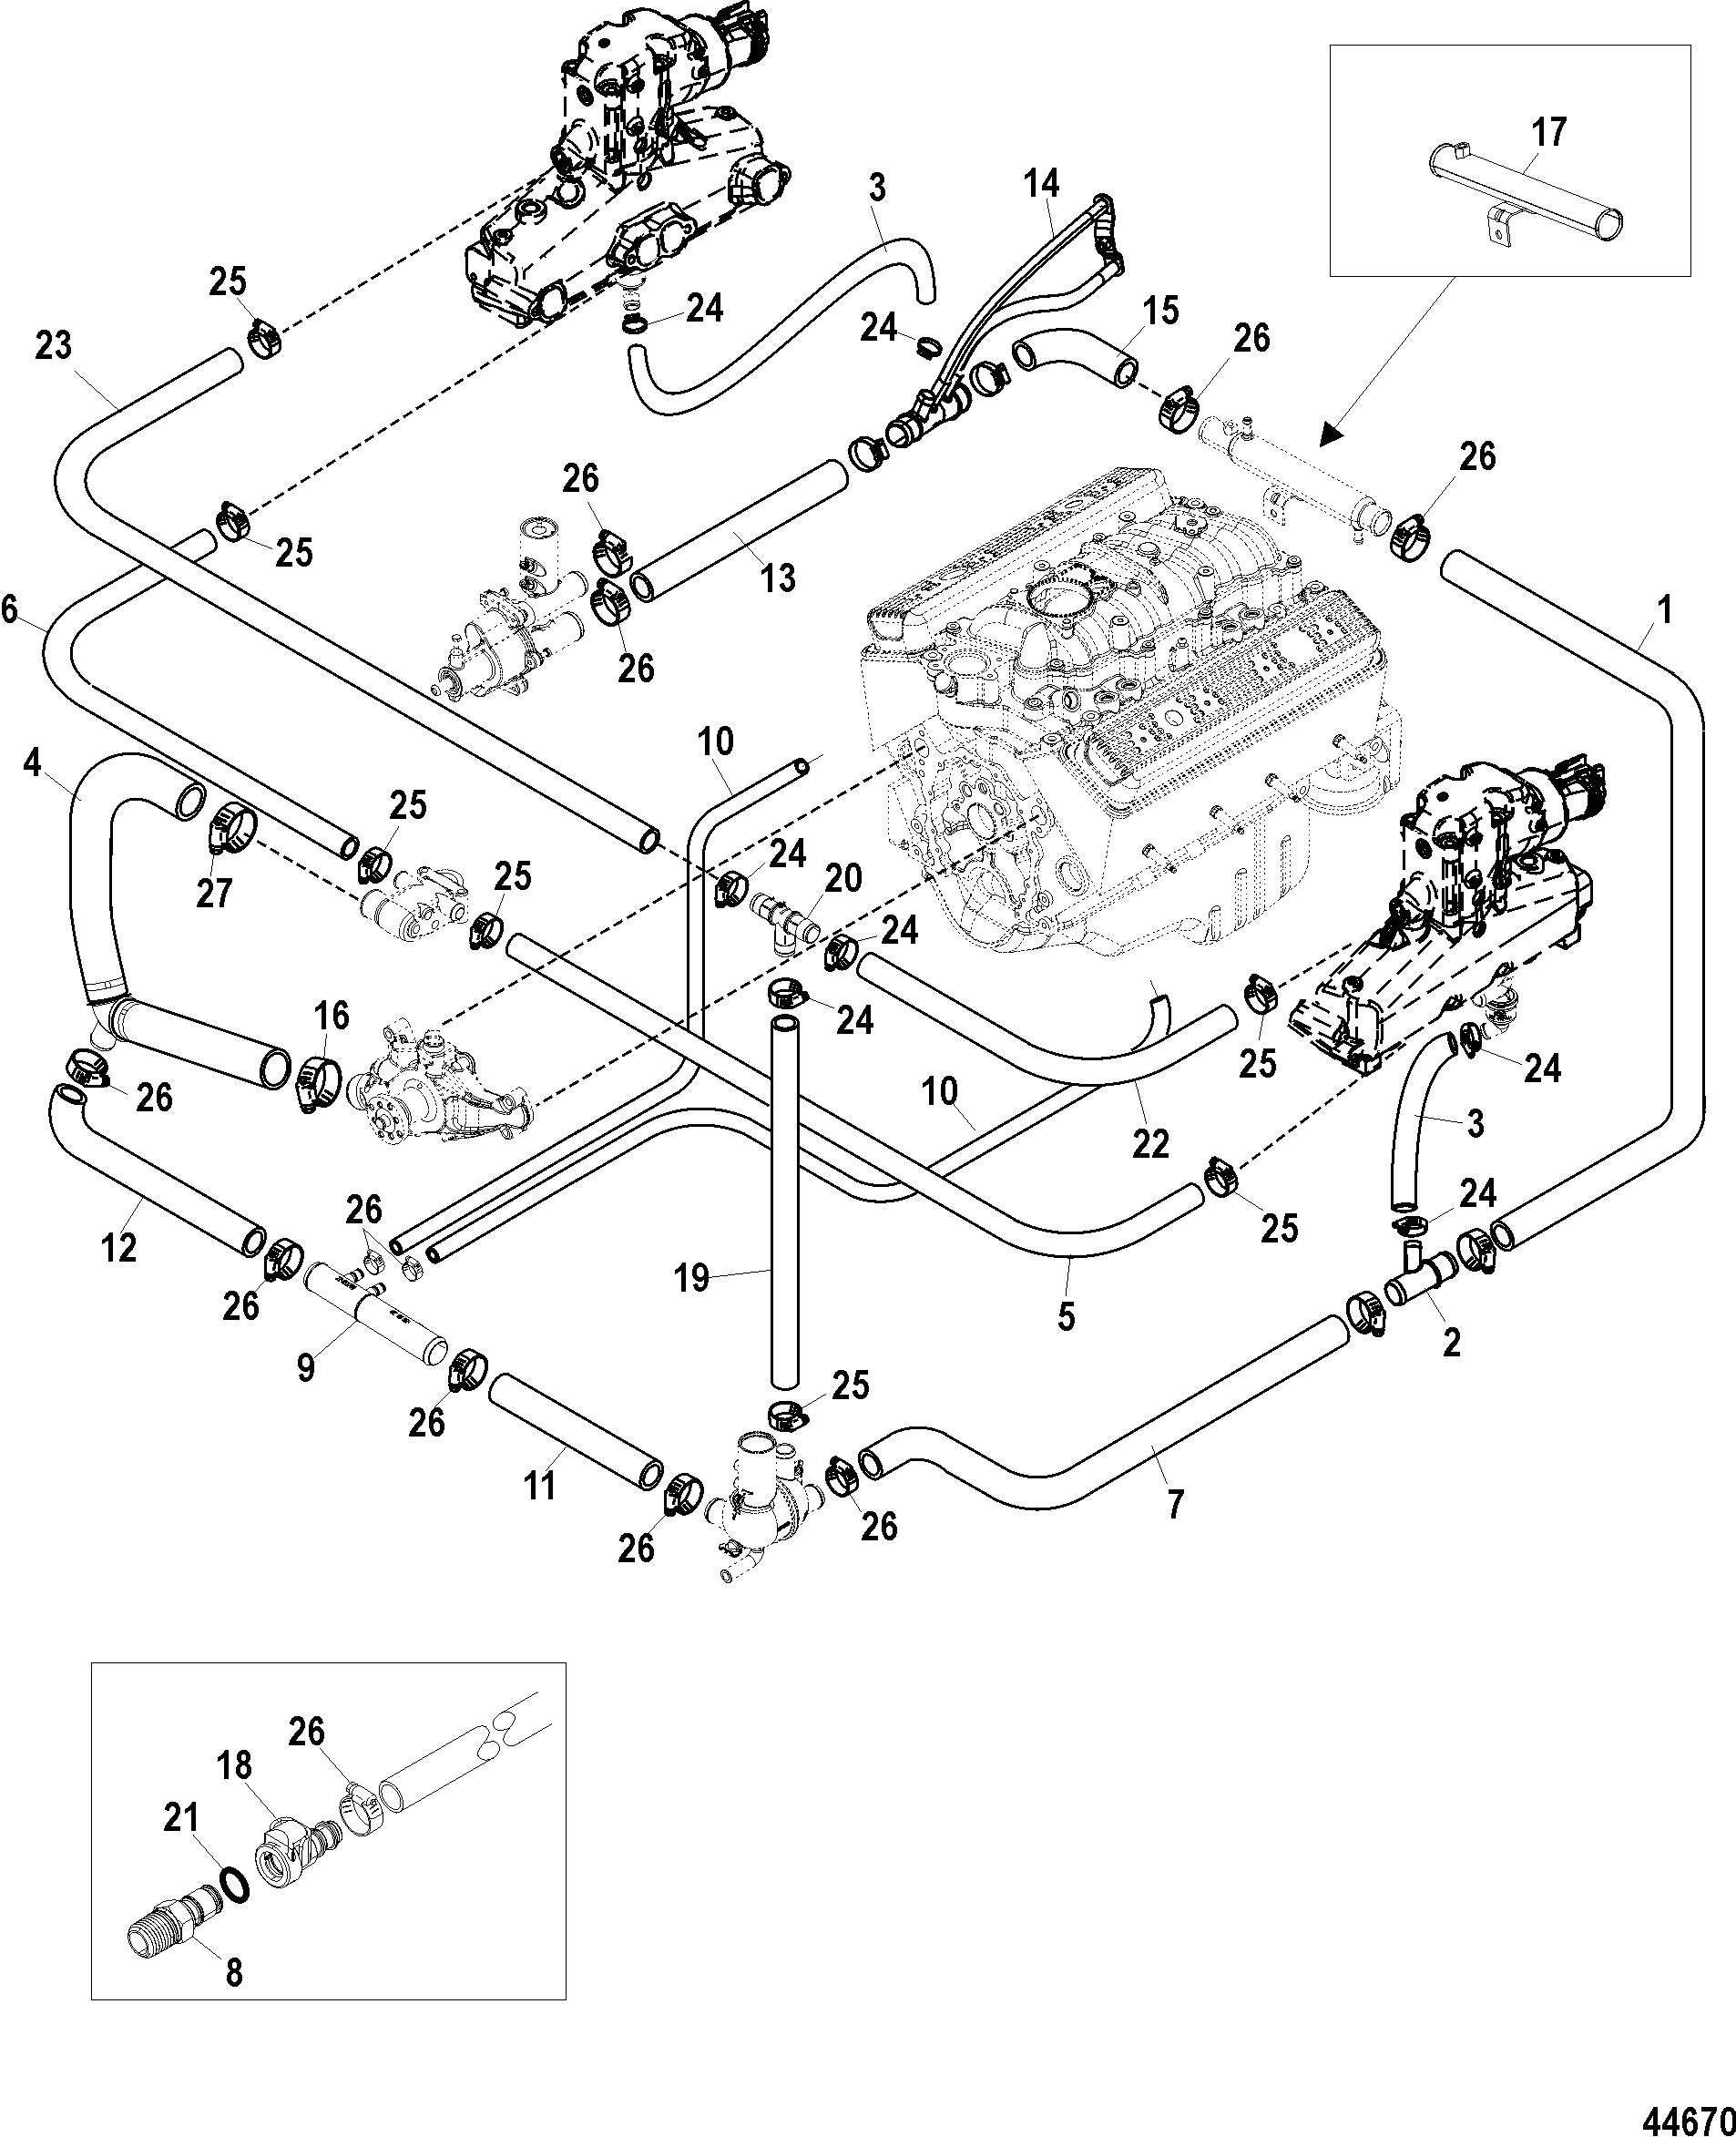 Mercruiser 5.0 Mpi Wiring Diagram